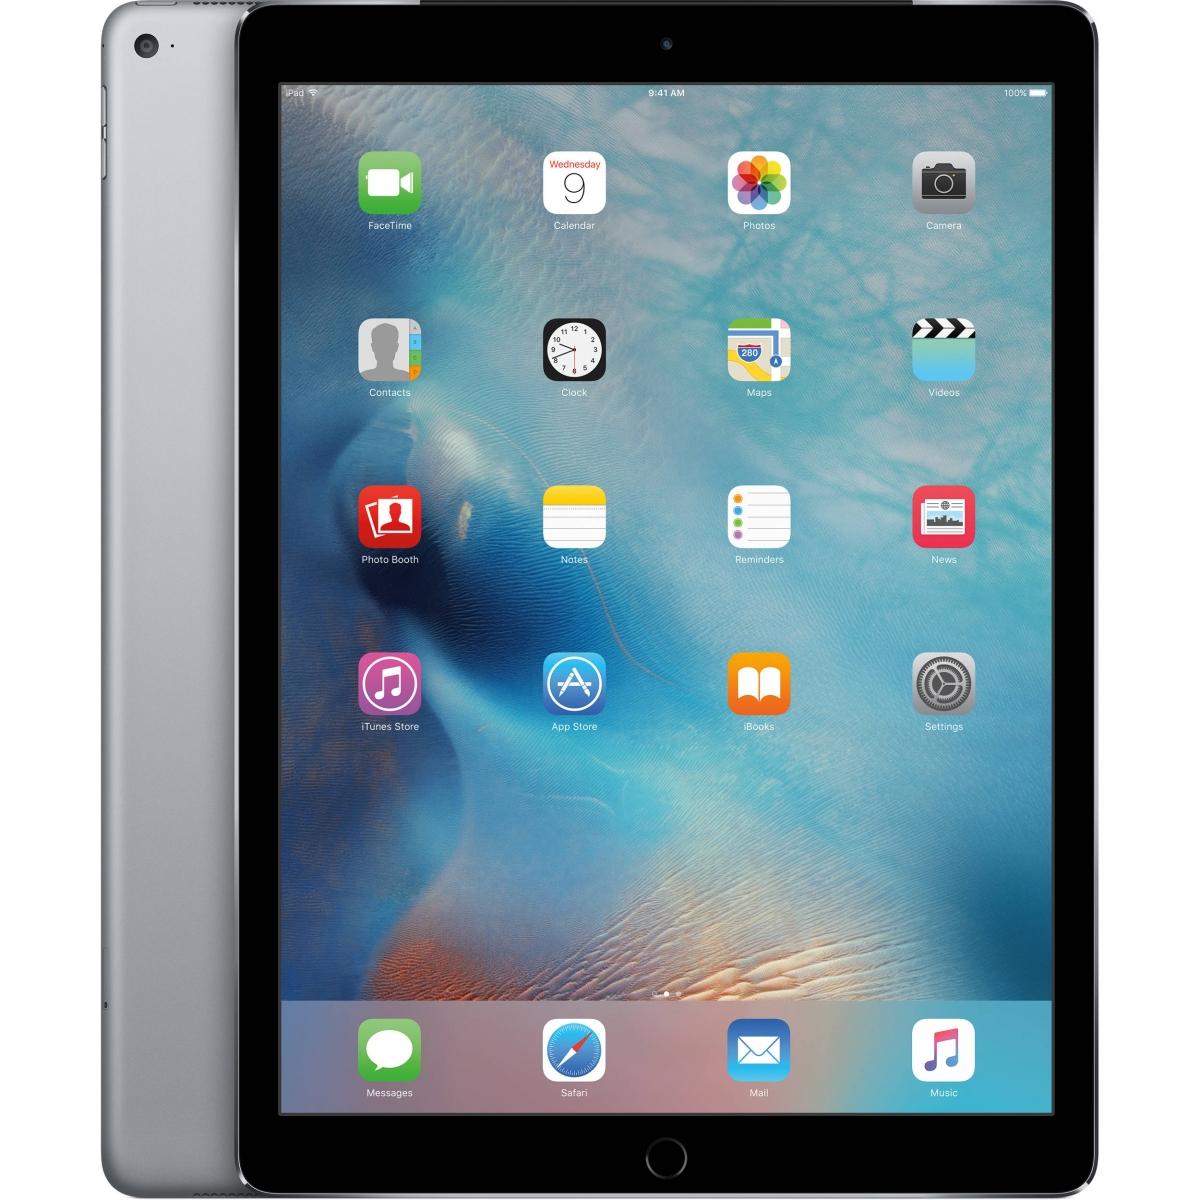 Apple iPad Pro Cellular, 128GB - Space Grey - bazarový použitý ML2I2FD/A